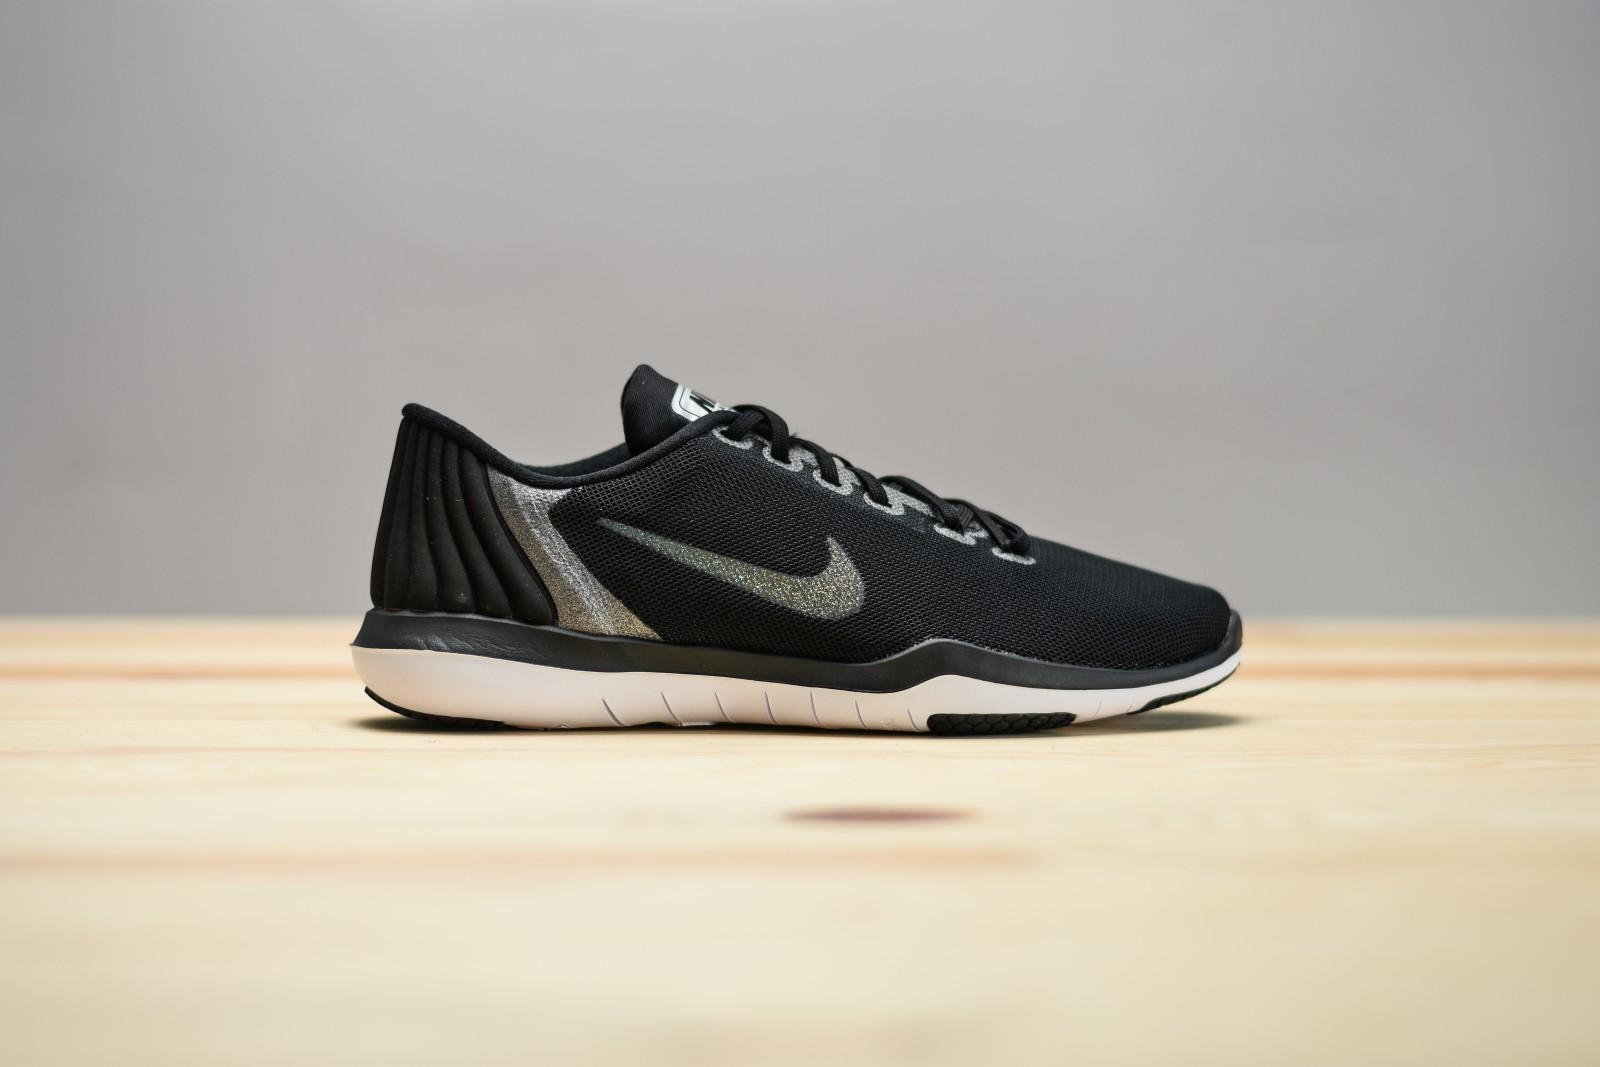 Dámská fitness obuv Nike W FLEX SUPREME TR 5 MTLC  03d58c6dde